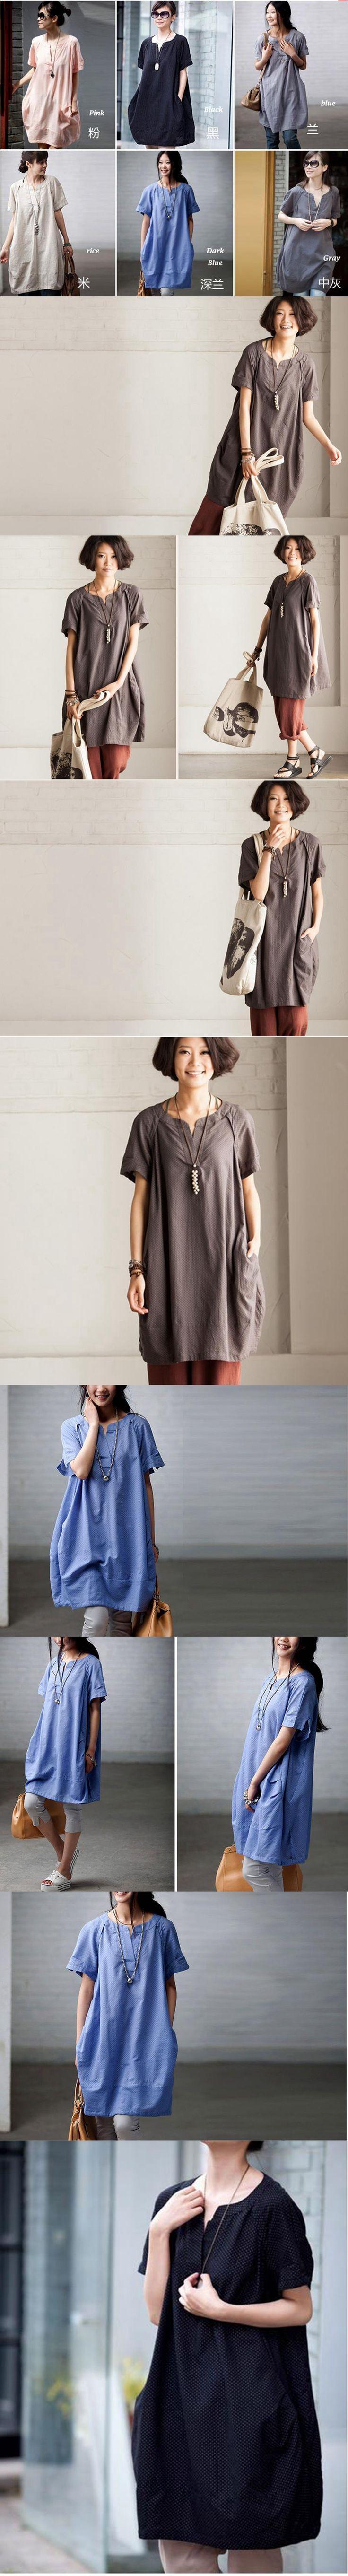 Black and Blue Gray loose cotton Shirt top Cotton dress by Fantasylinen